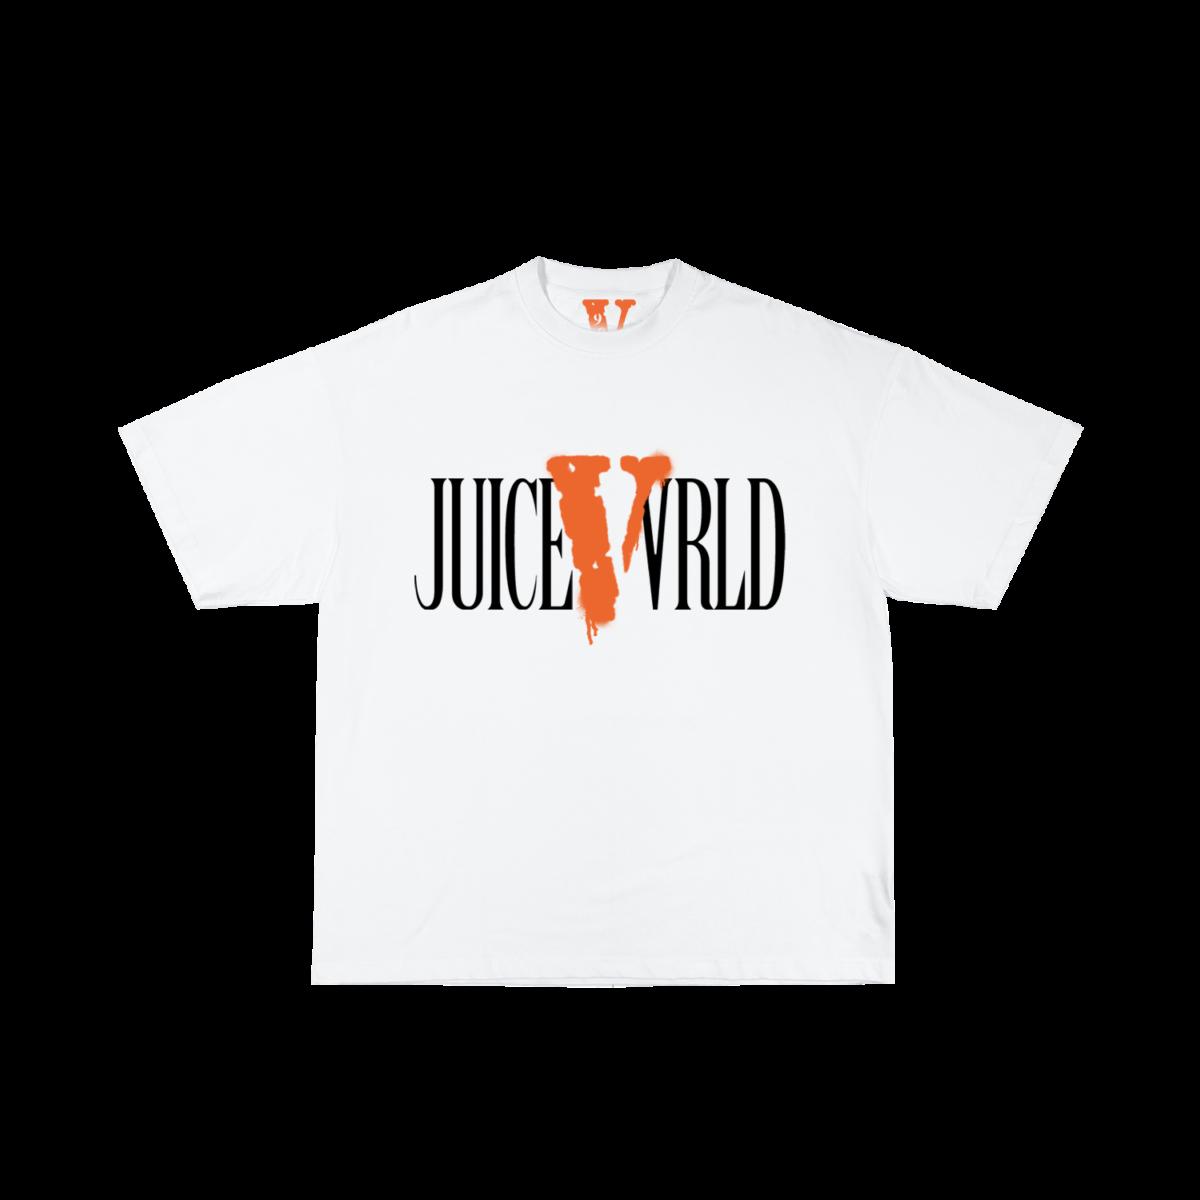 Juice Wrld X-Vlone shirt